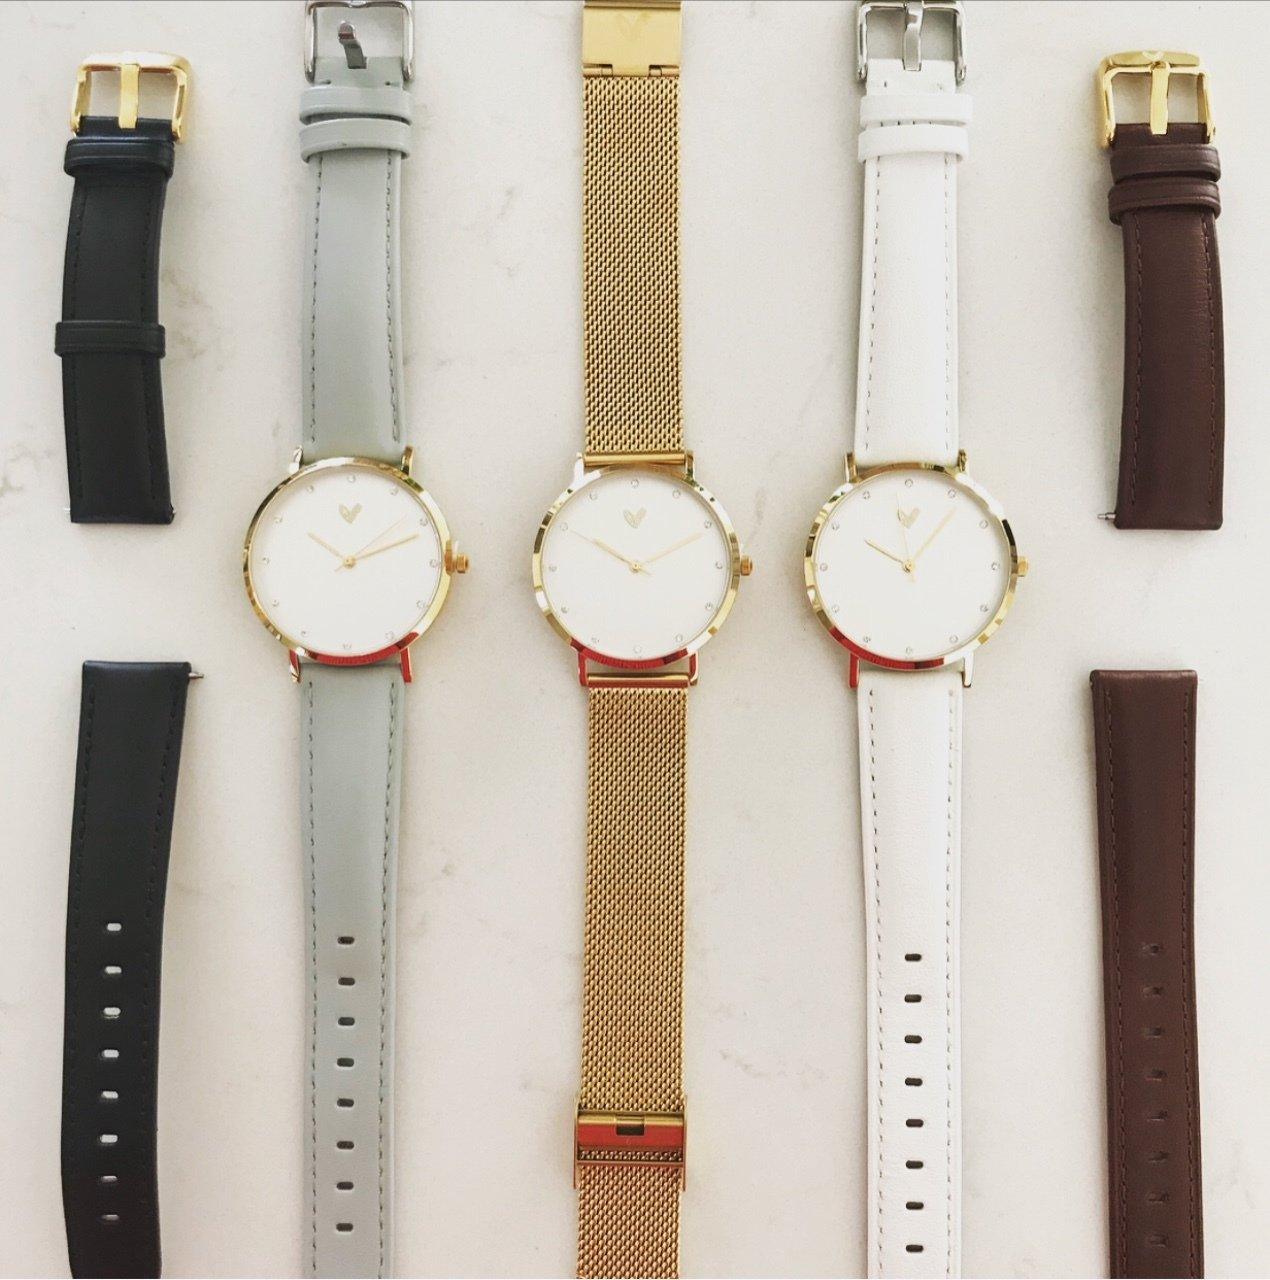 Interchangeable watch straps